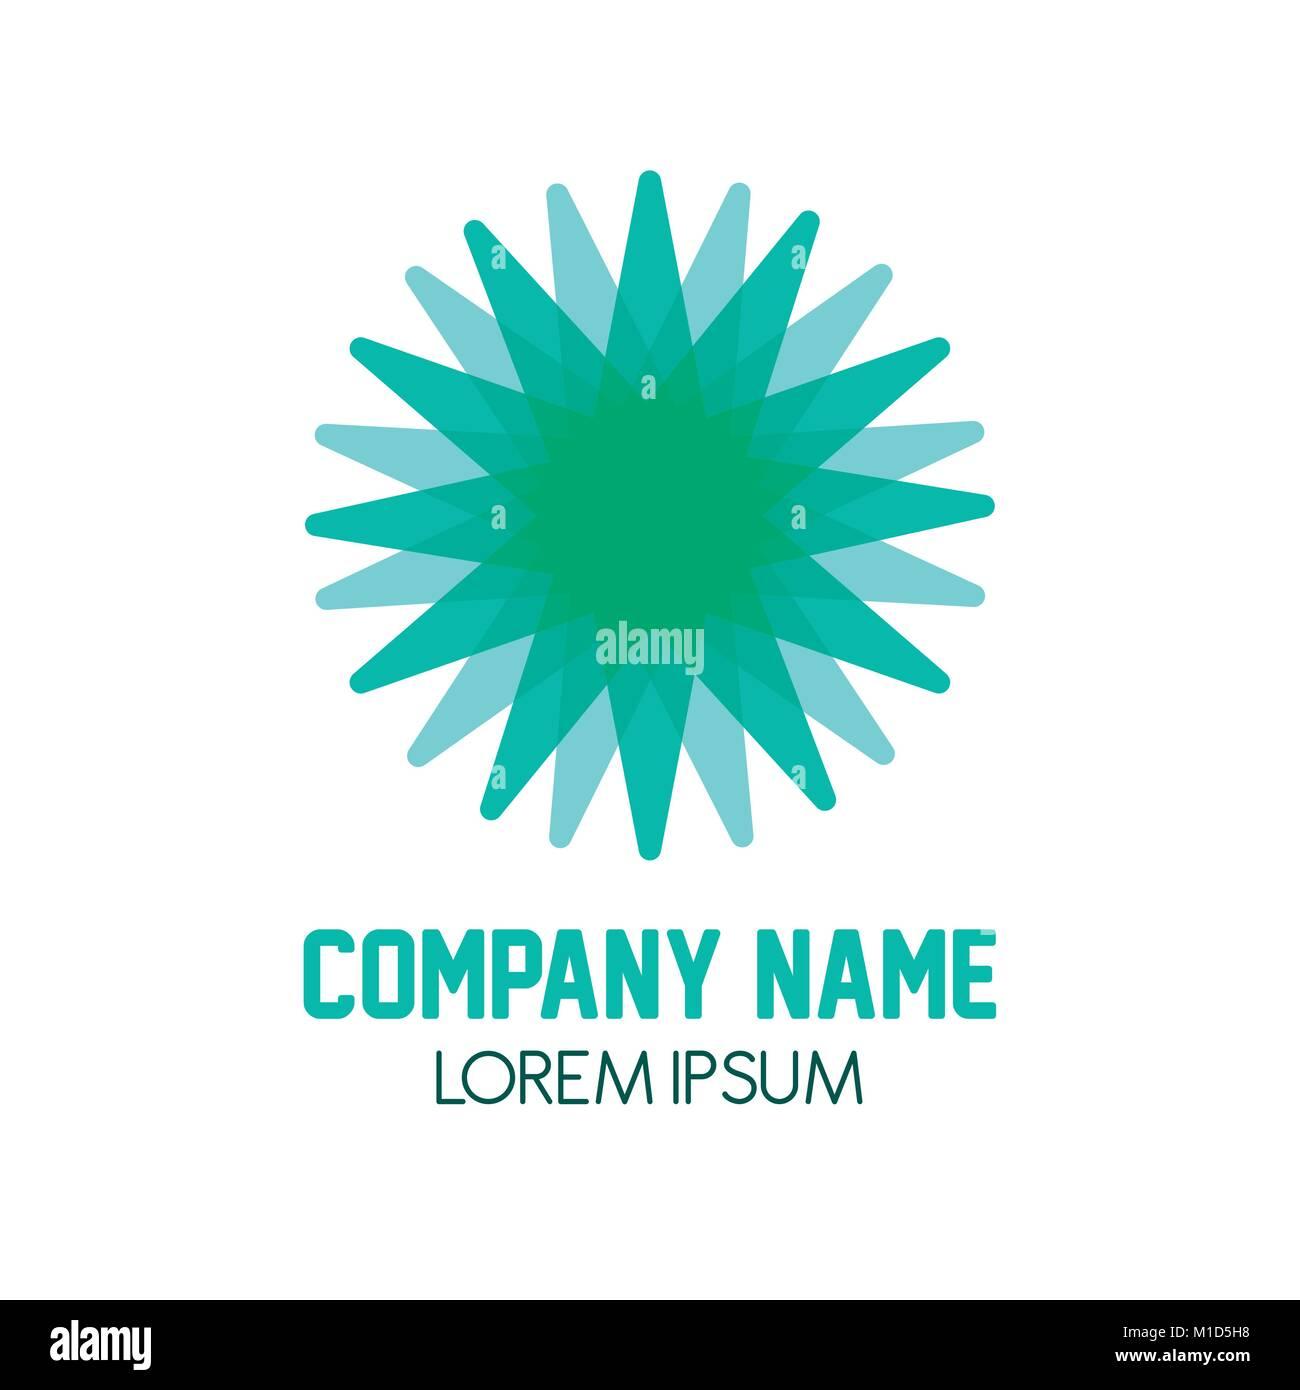 Company name symbol stock vector art illustration vector image company name symbol buycottarizona